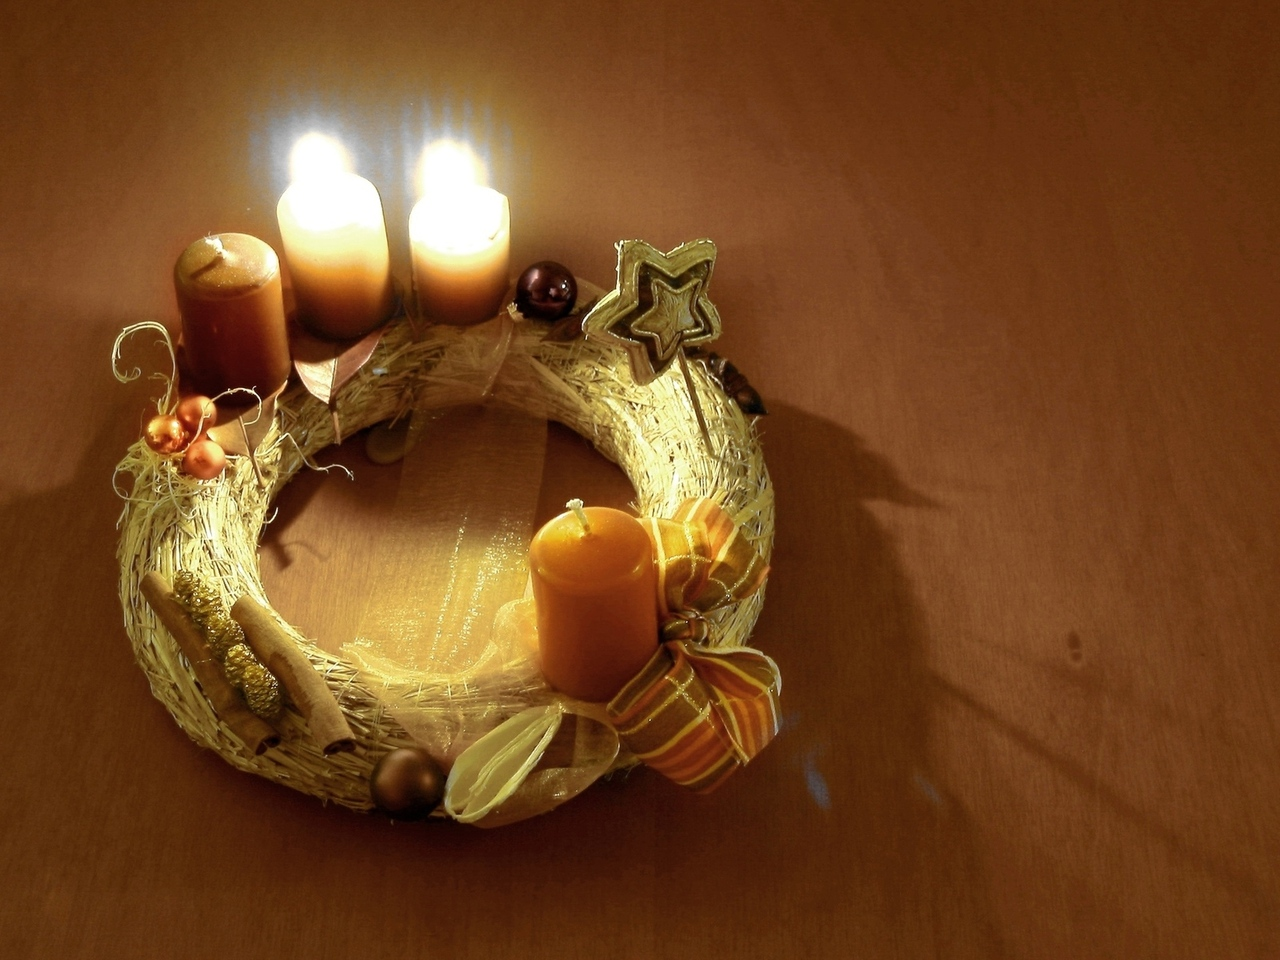 advent-wreath-2-1517586-1280x960